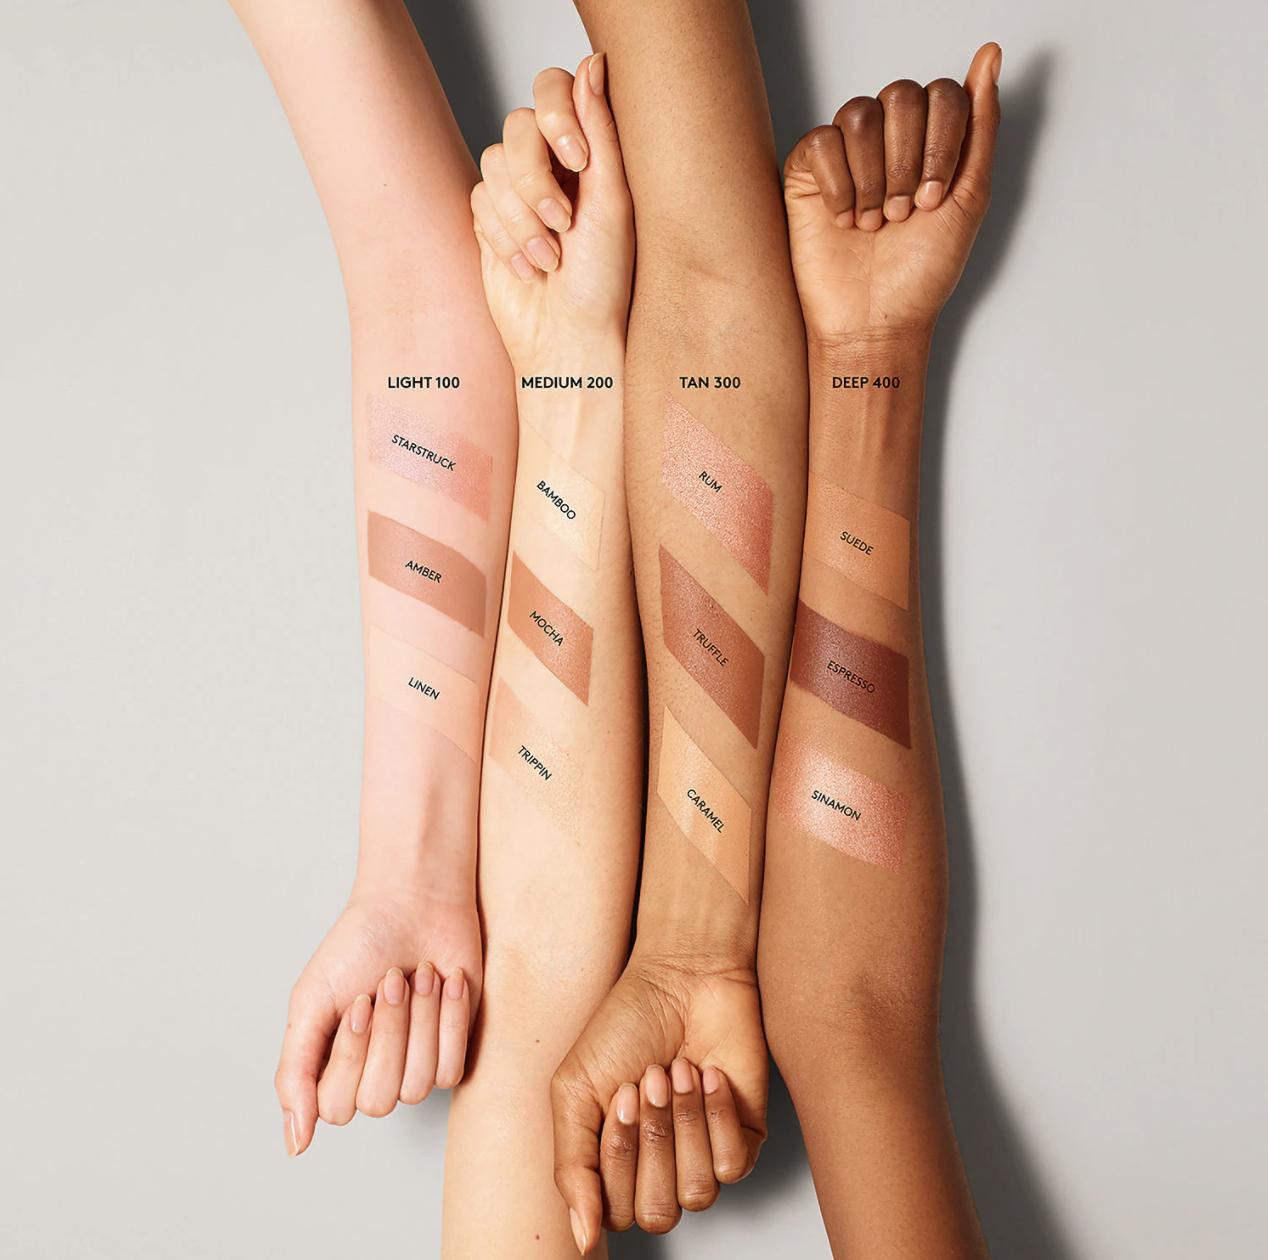 Light, medium, and deep stick swatches across light, medium, and deep skin tones